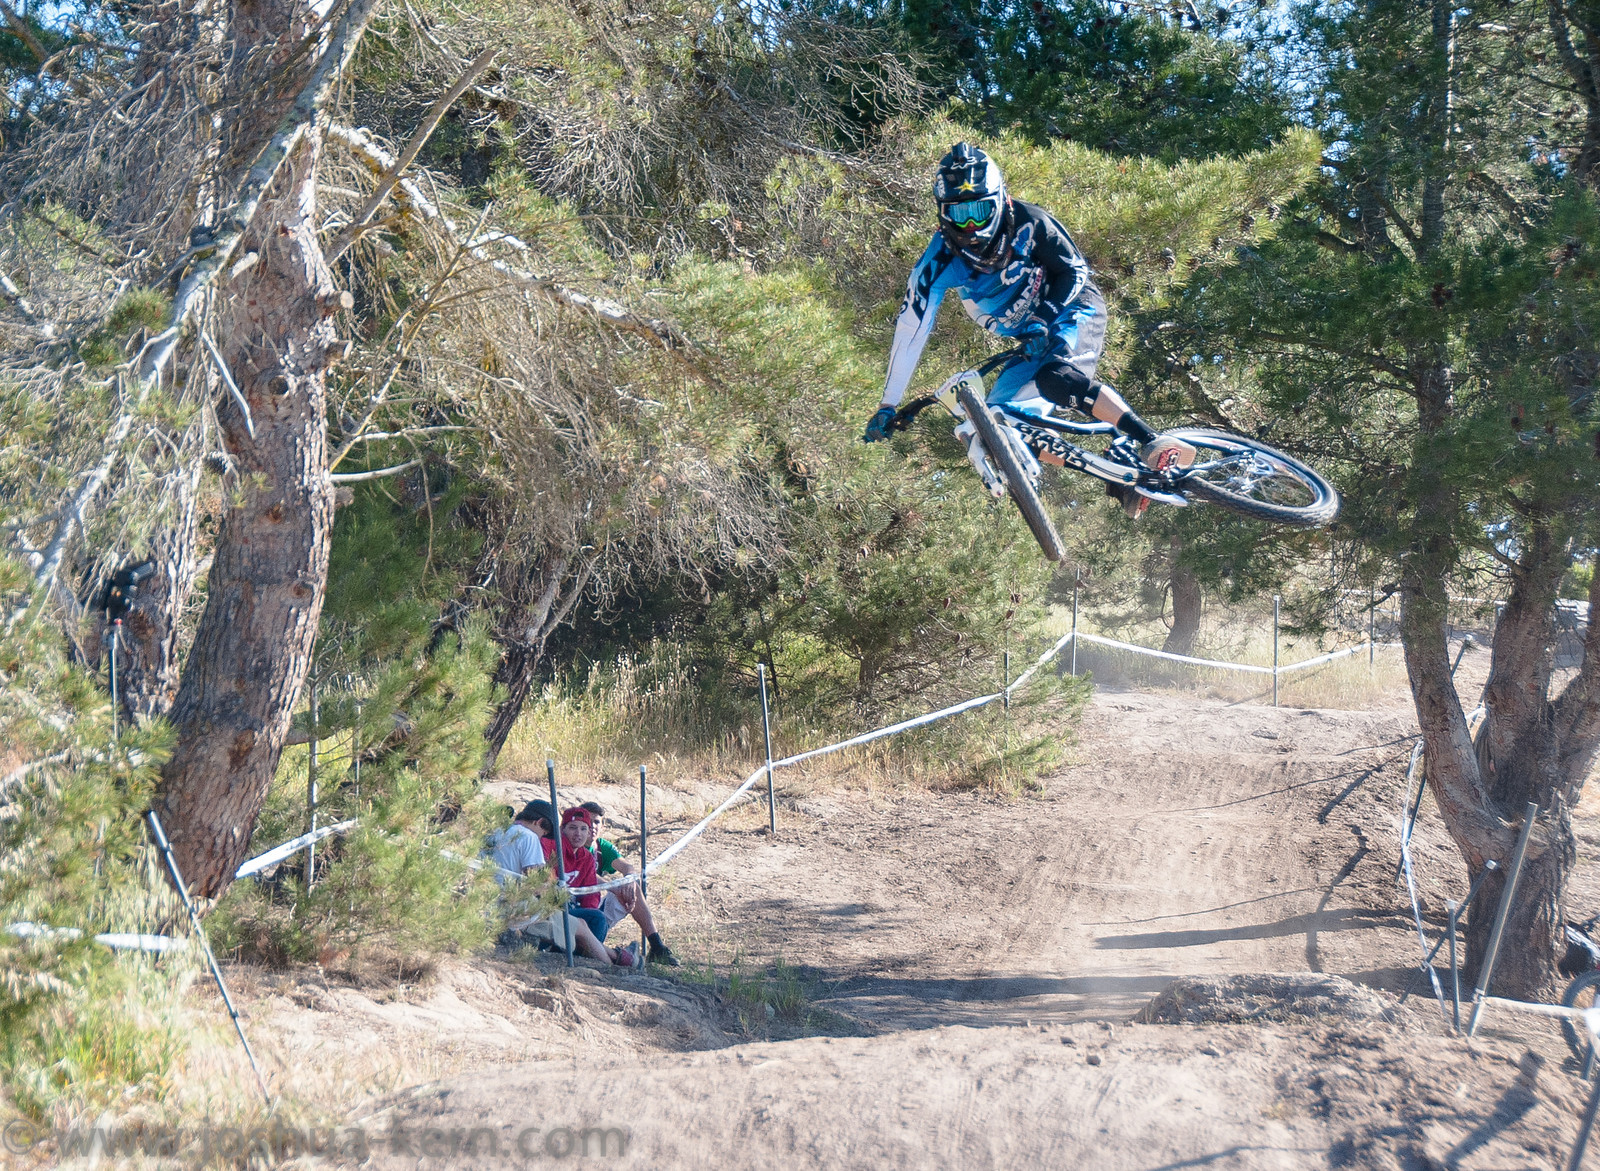 4-19-13DHPractice (6 of 36) - jkern620 - Mountain Biking Pictures - Vital MTB